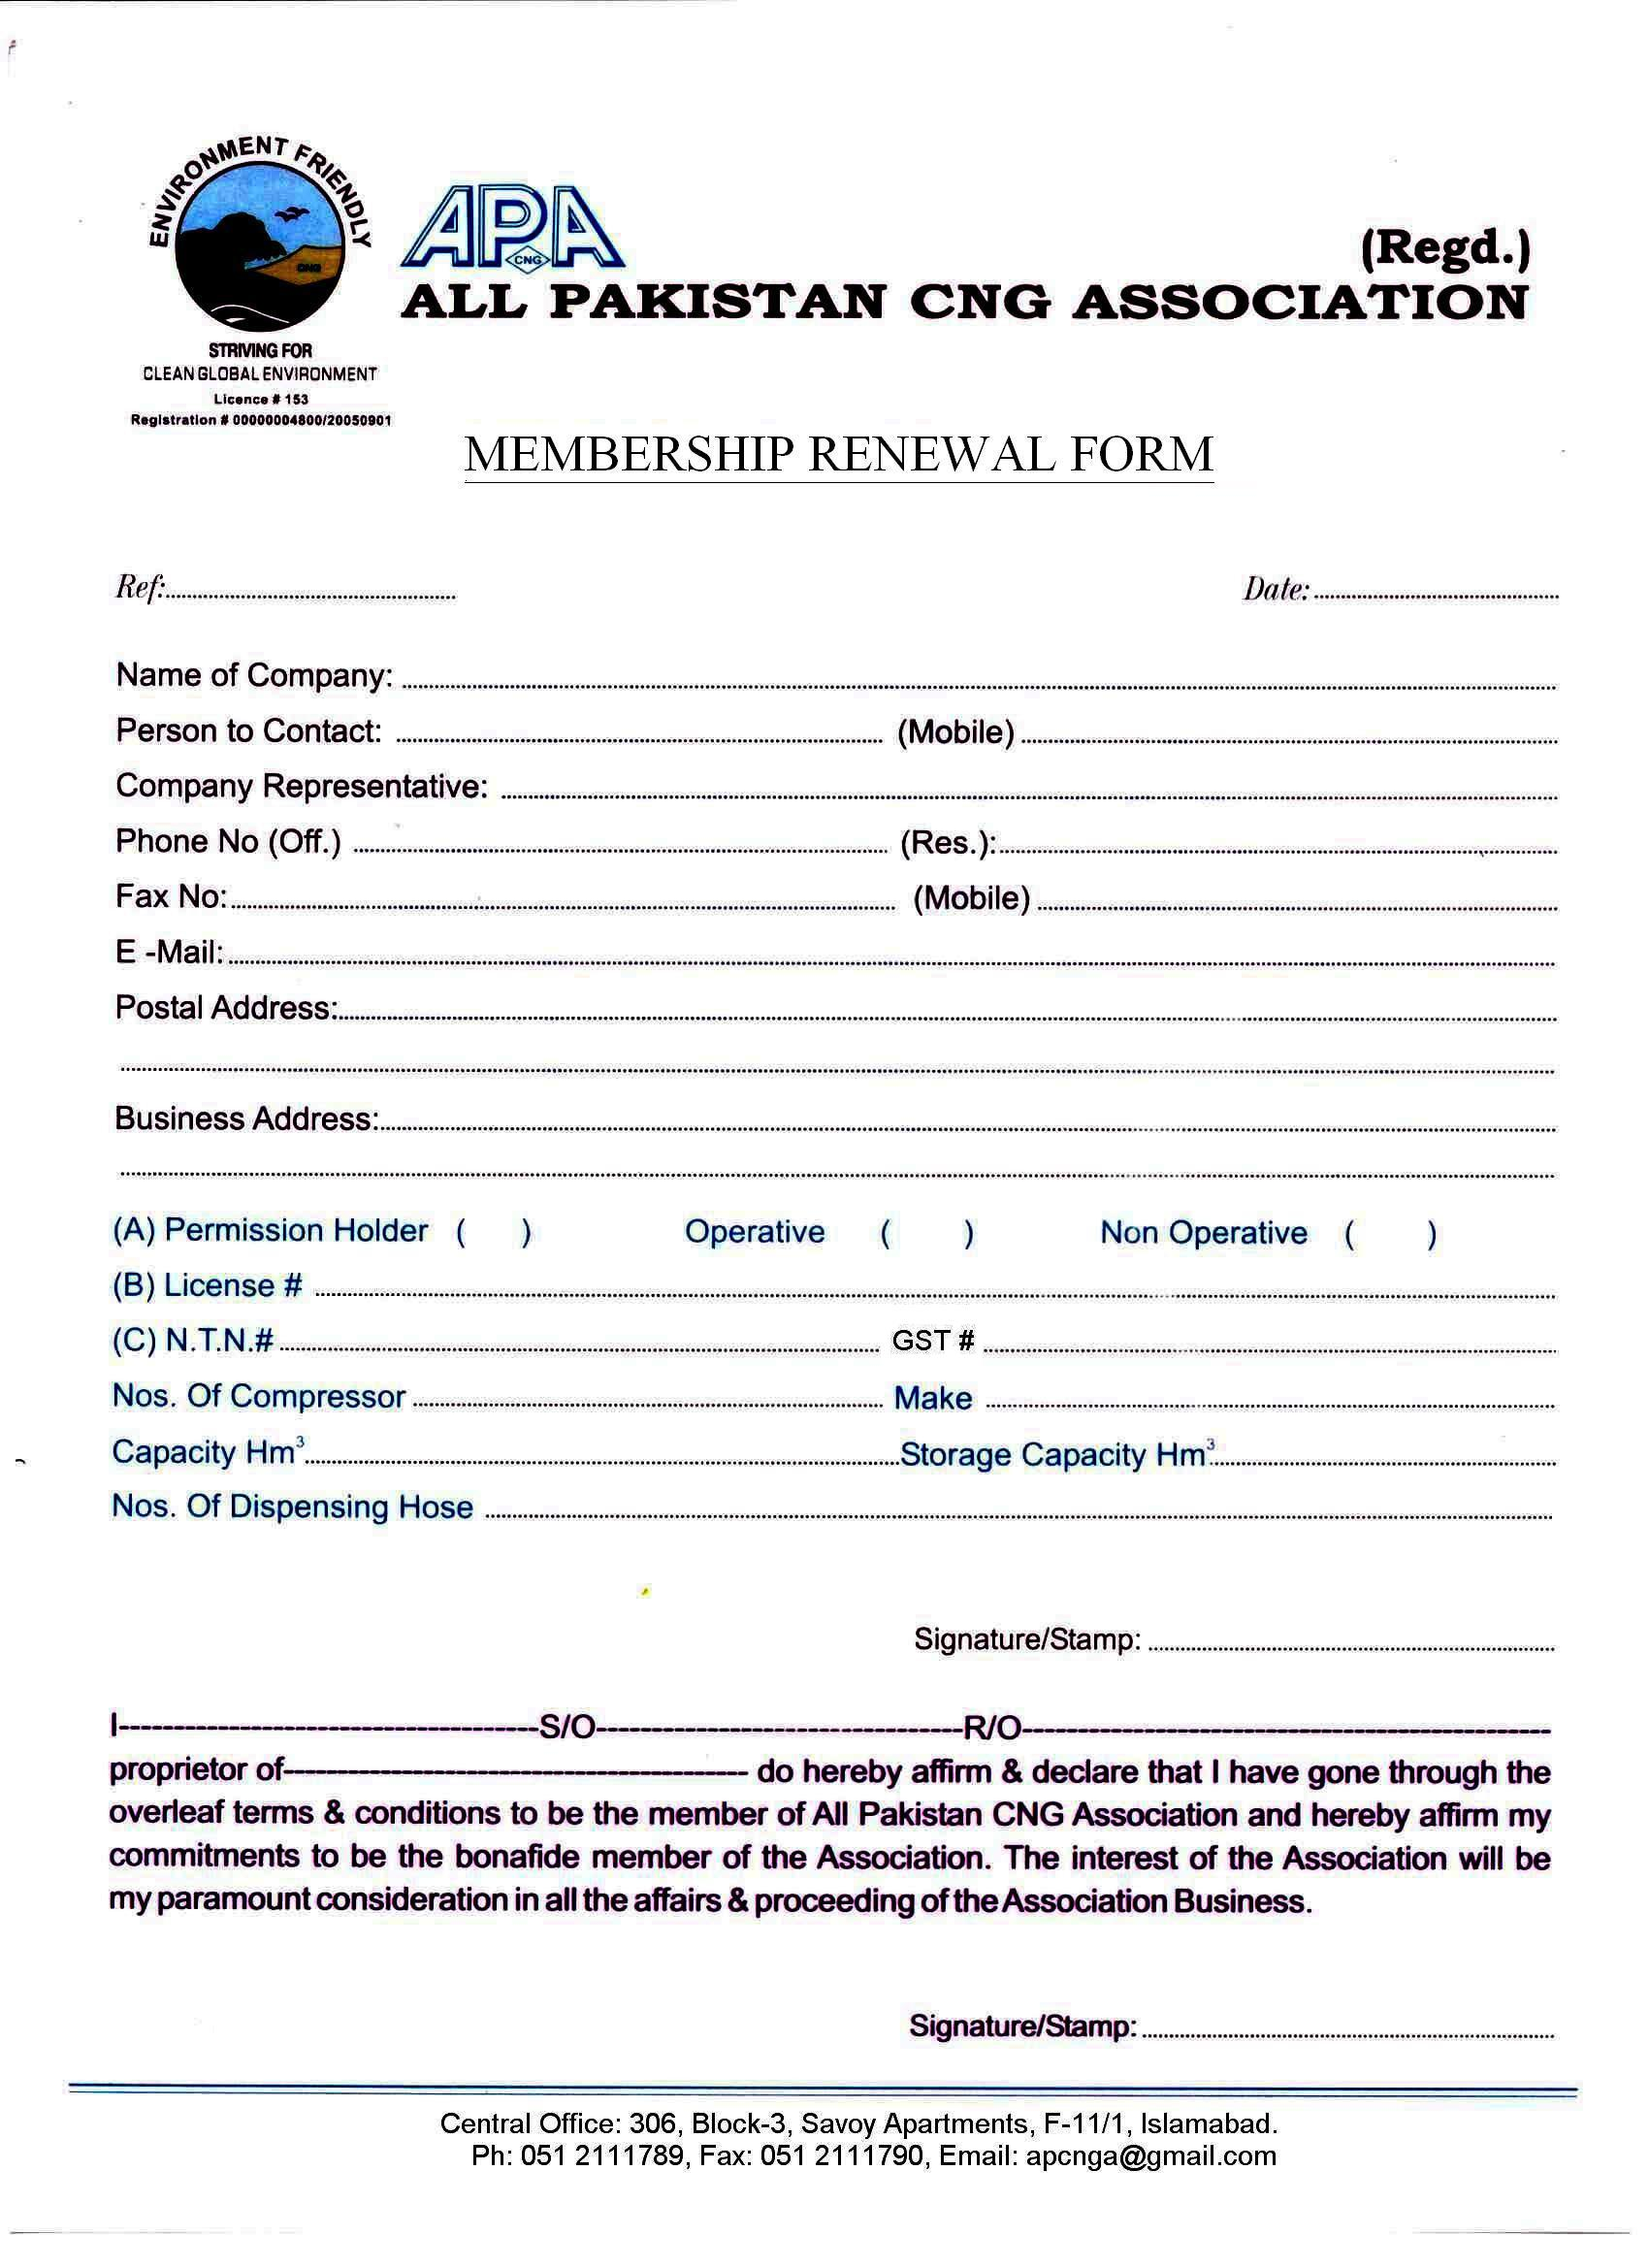 Membership Renewal Procedure 2016 | All Pakistan CNG Association